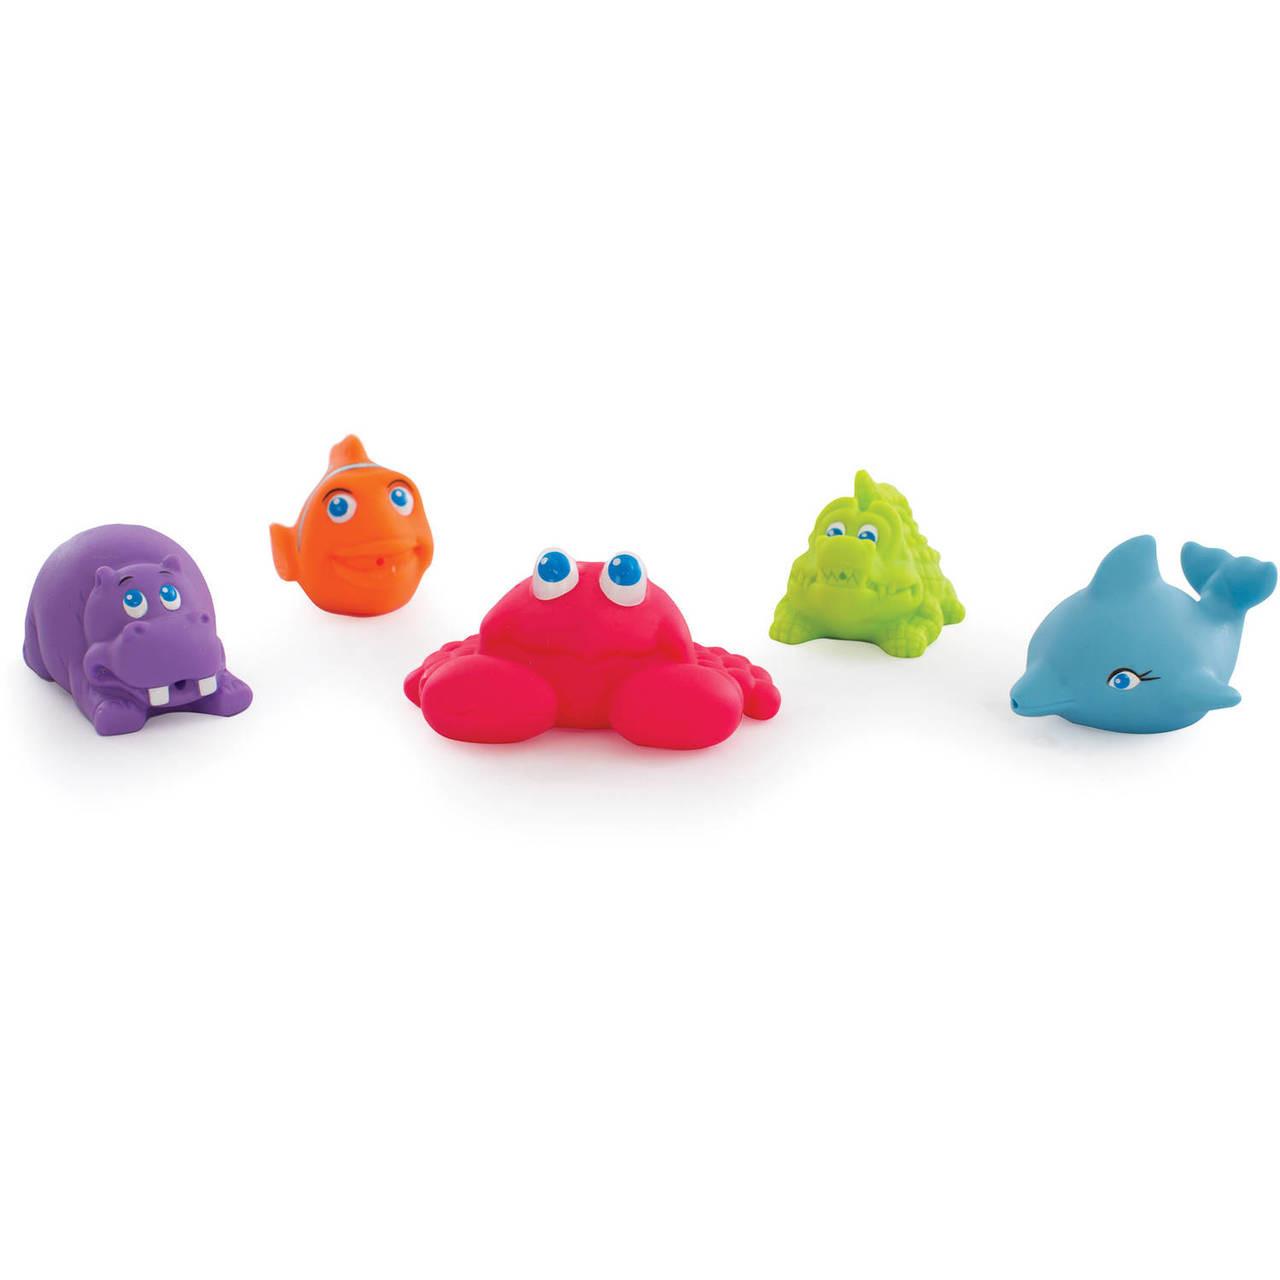 Playgro Under the Sea Squirtees 5pcs Bath Toy